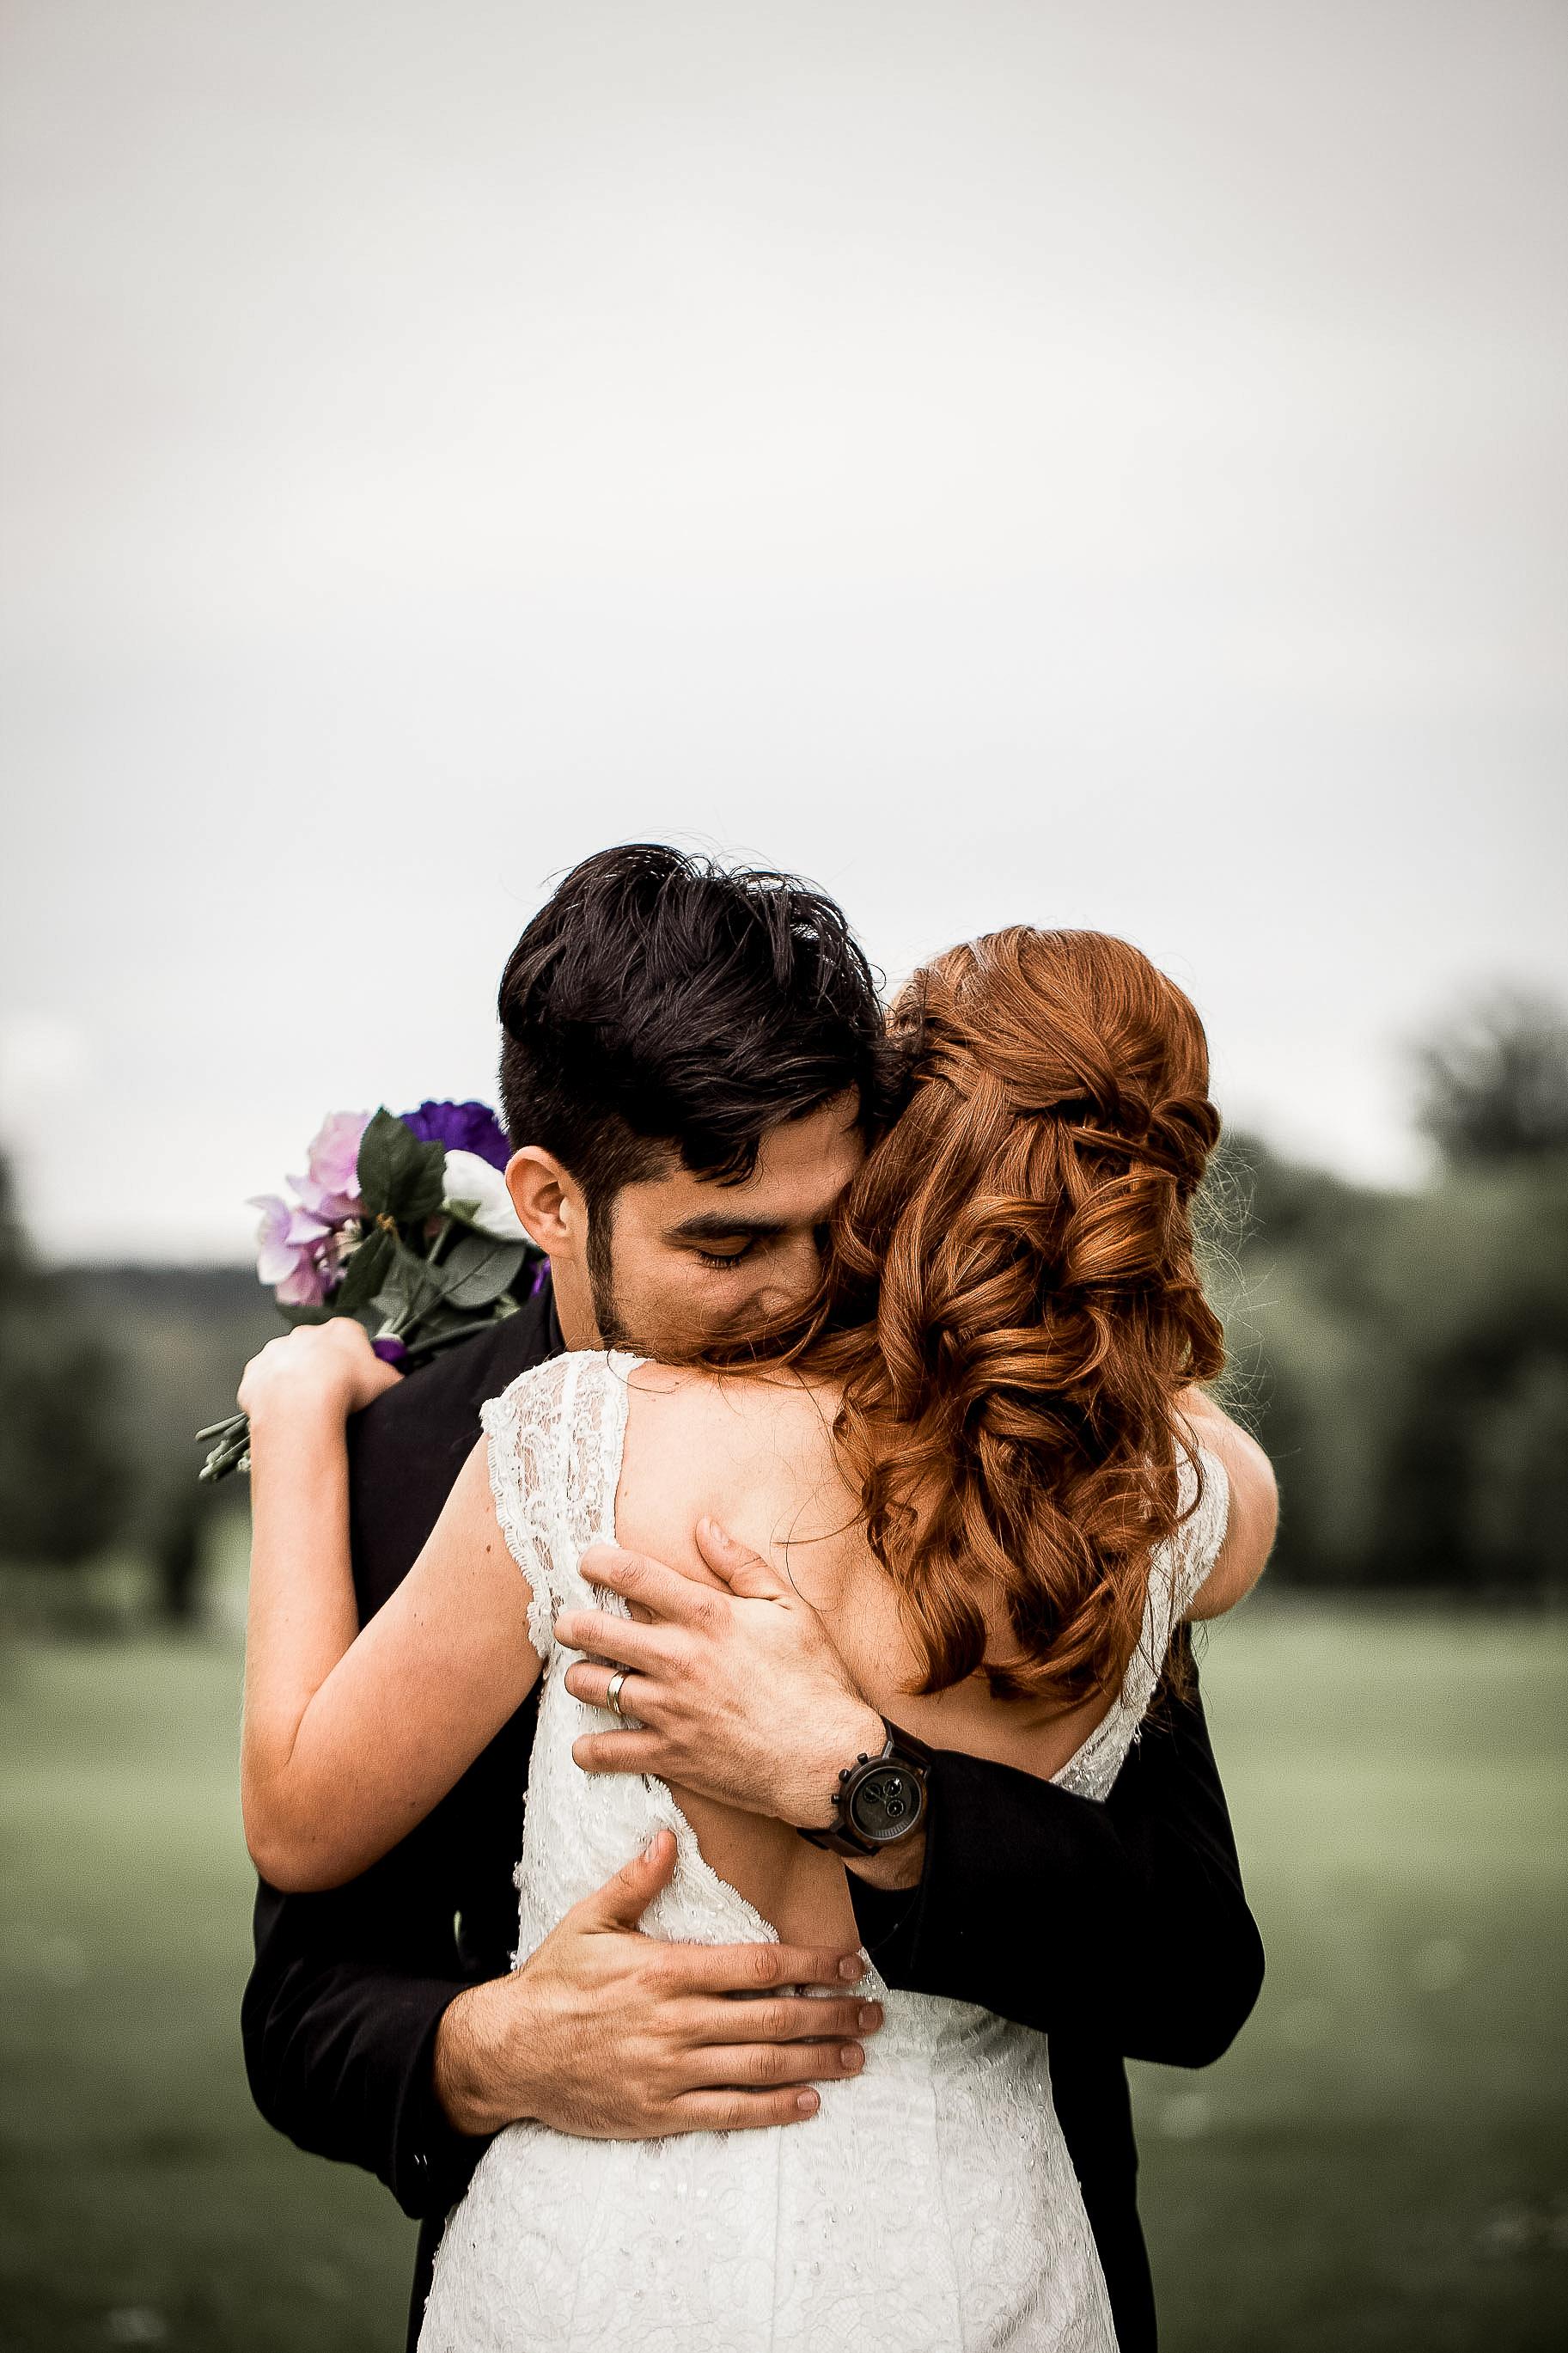 pittsburgh_wedding_photographer_liz_capuano-0899.jpg